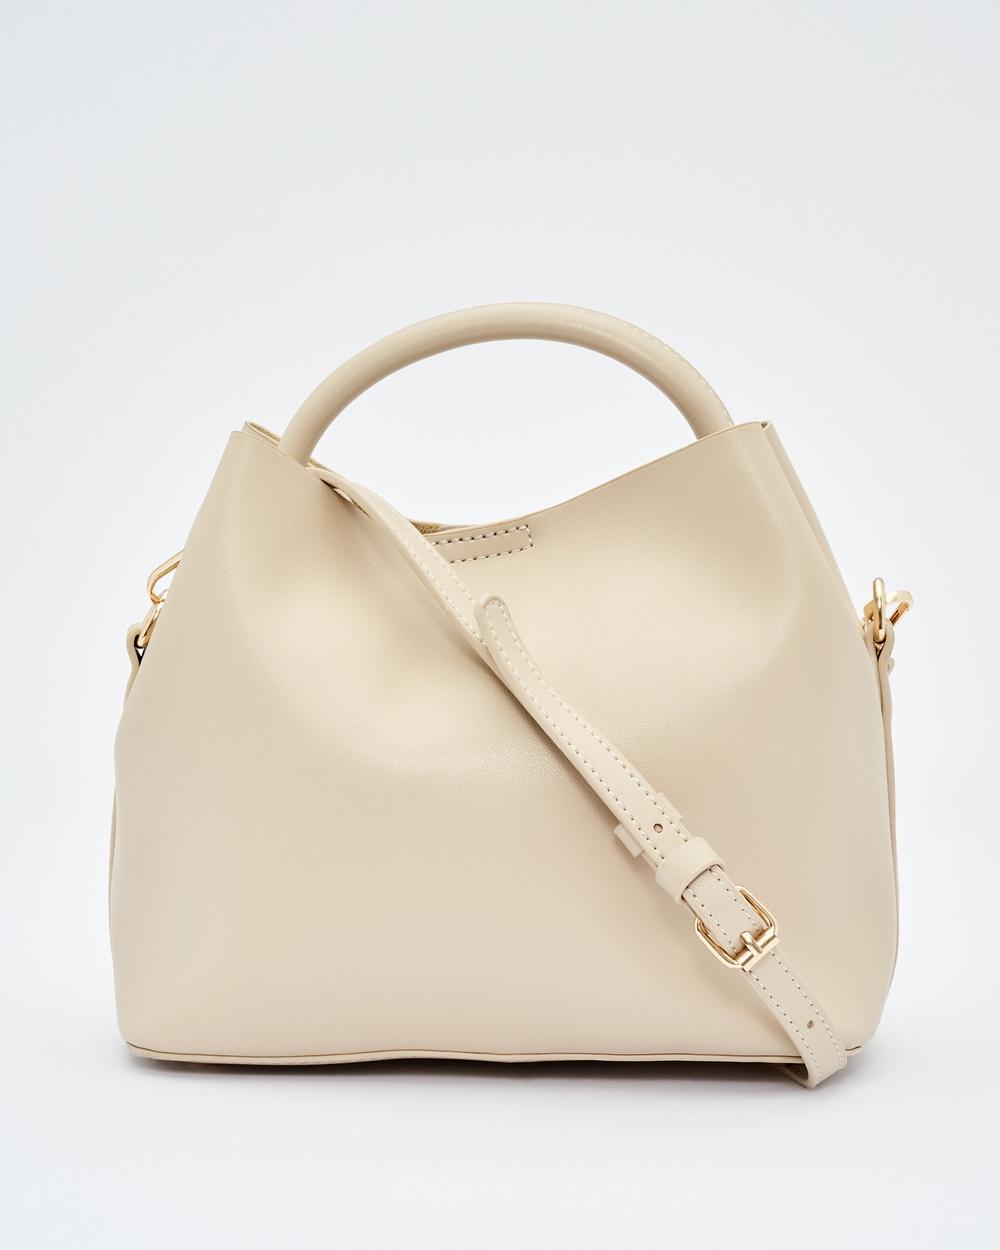 Tussah Willow Bag Handbags Beige